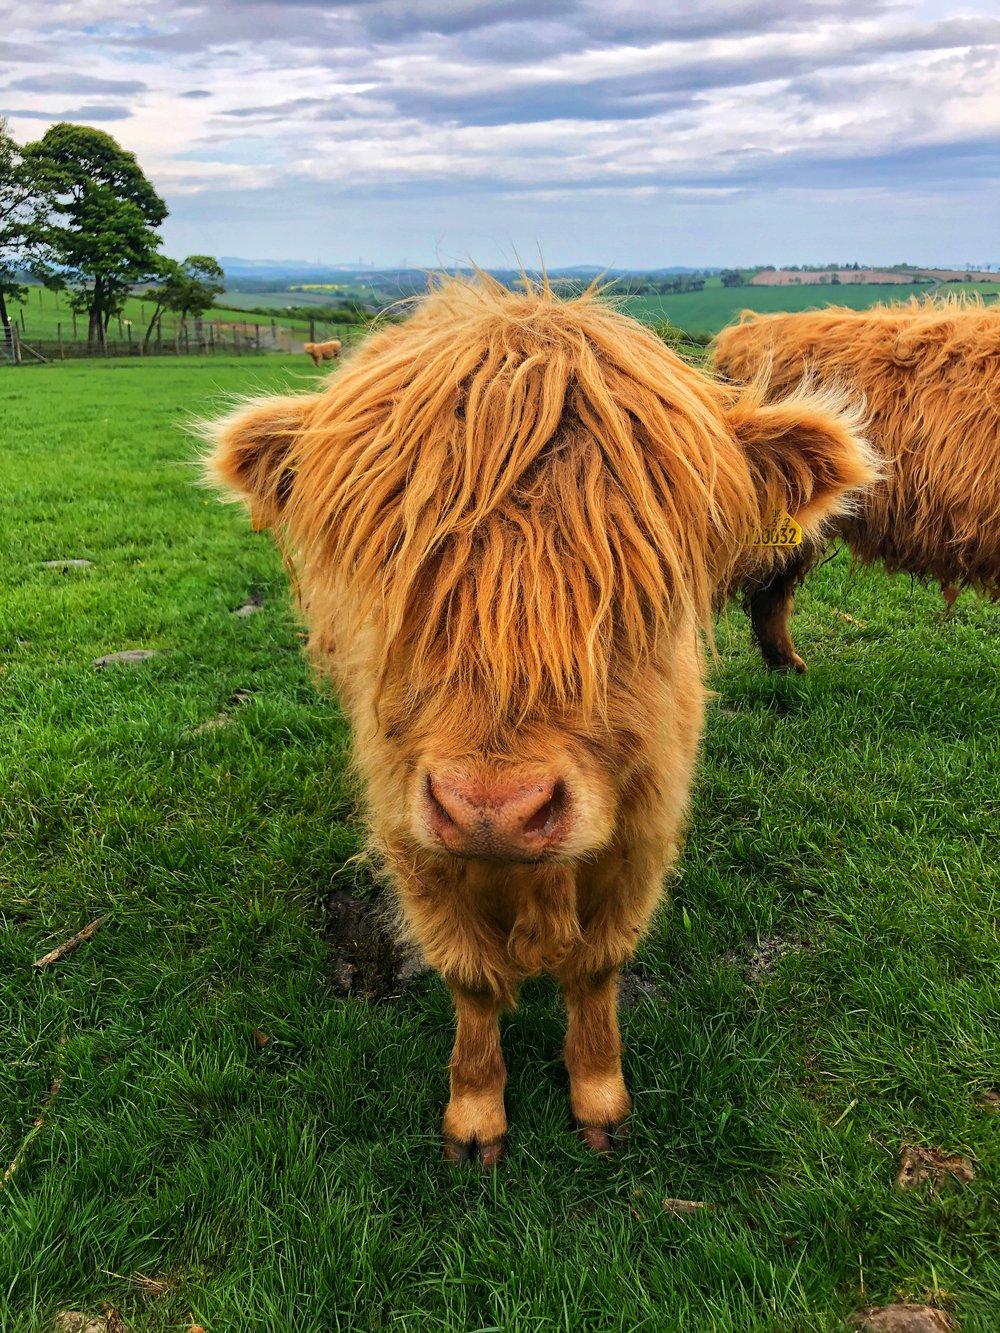 Met a Cow